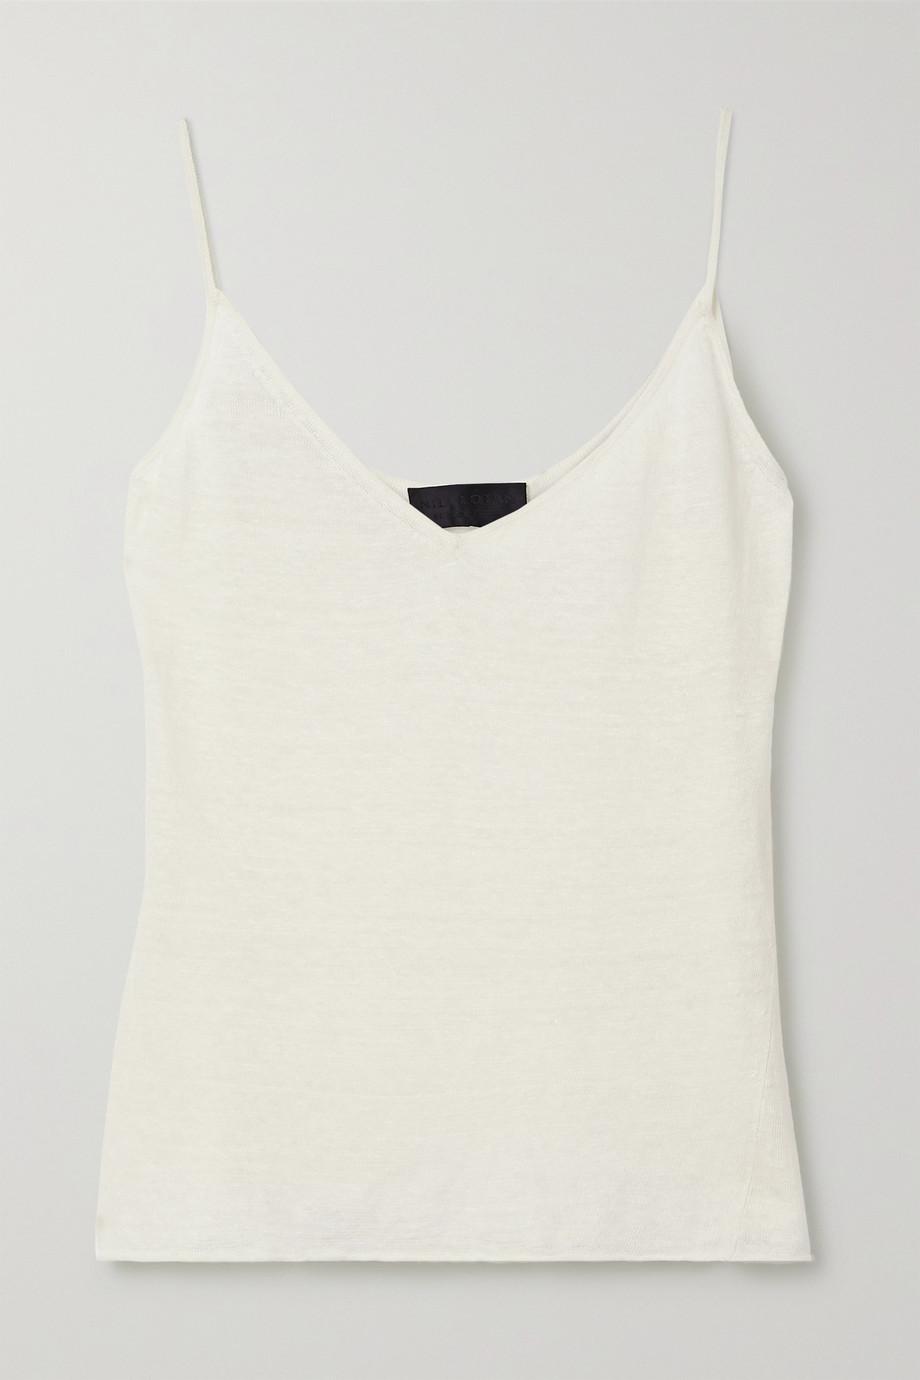 Nili Lotan Kerry linen camisole